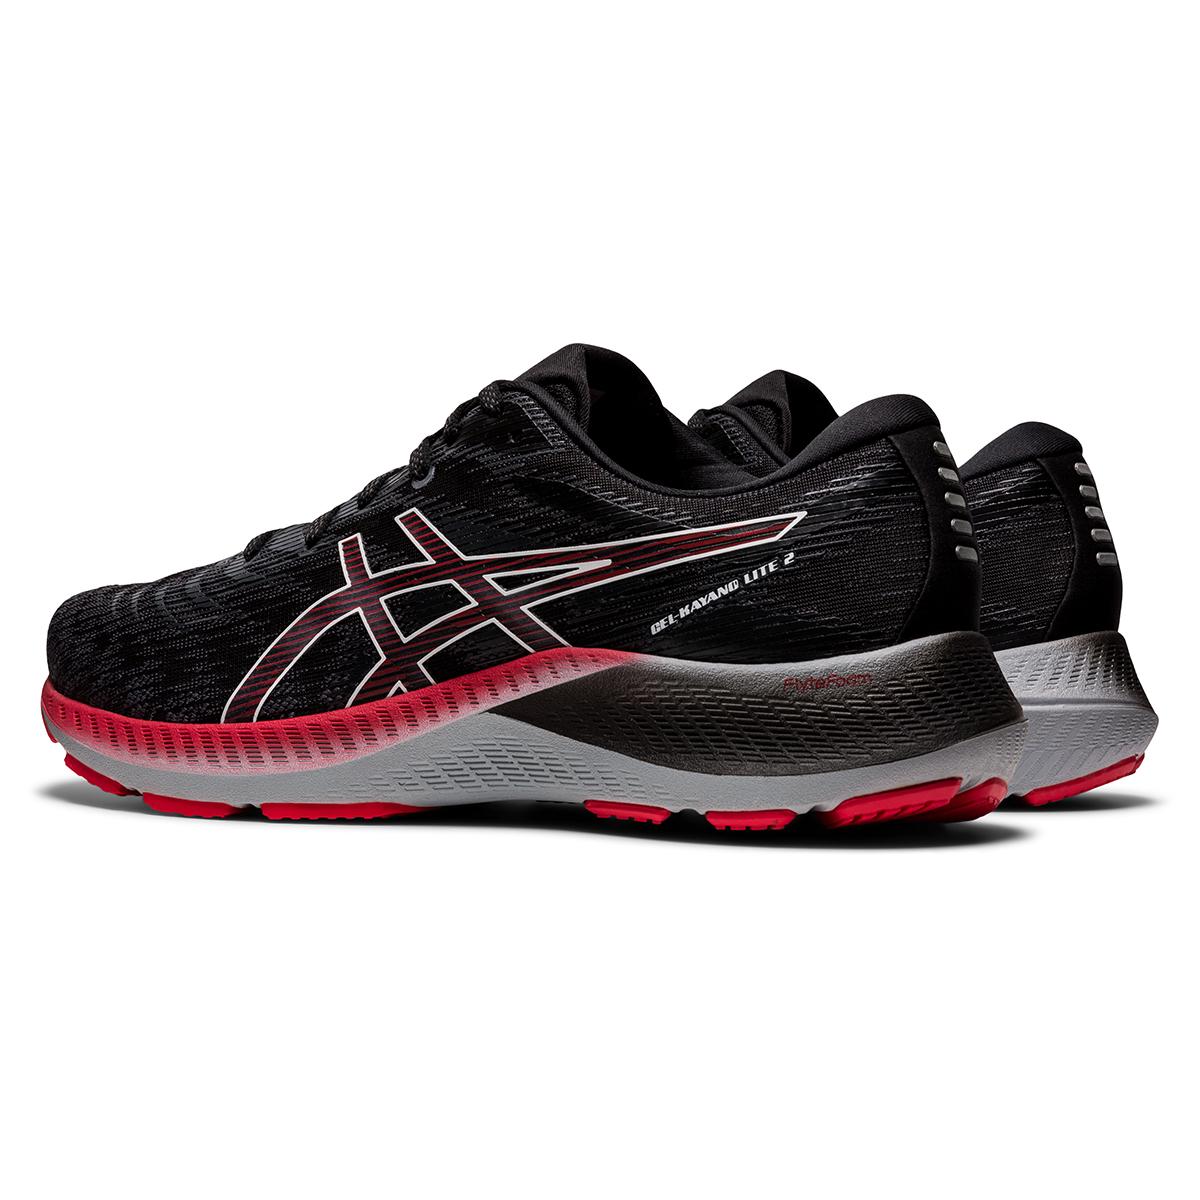 Men's Asics Gel-Kayano Lite 2 Running Shoe - Color: Black/White - Size: 7 - Width: Regular, Black/White, large, image 6